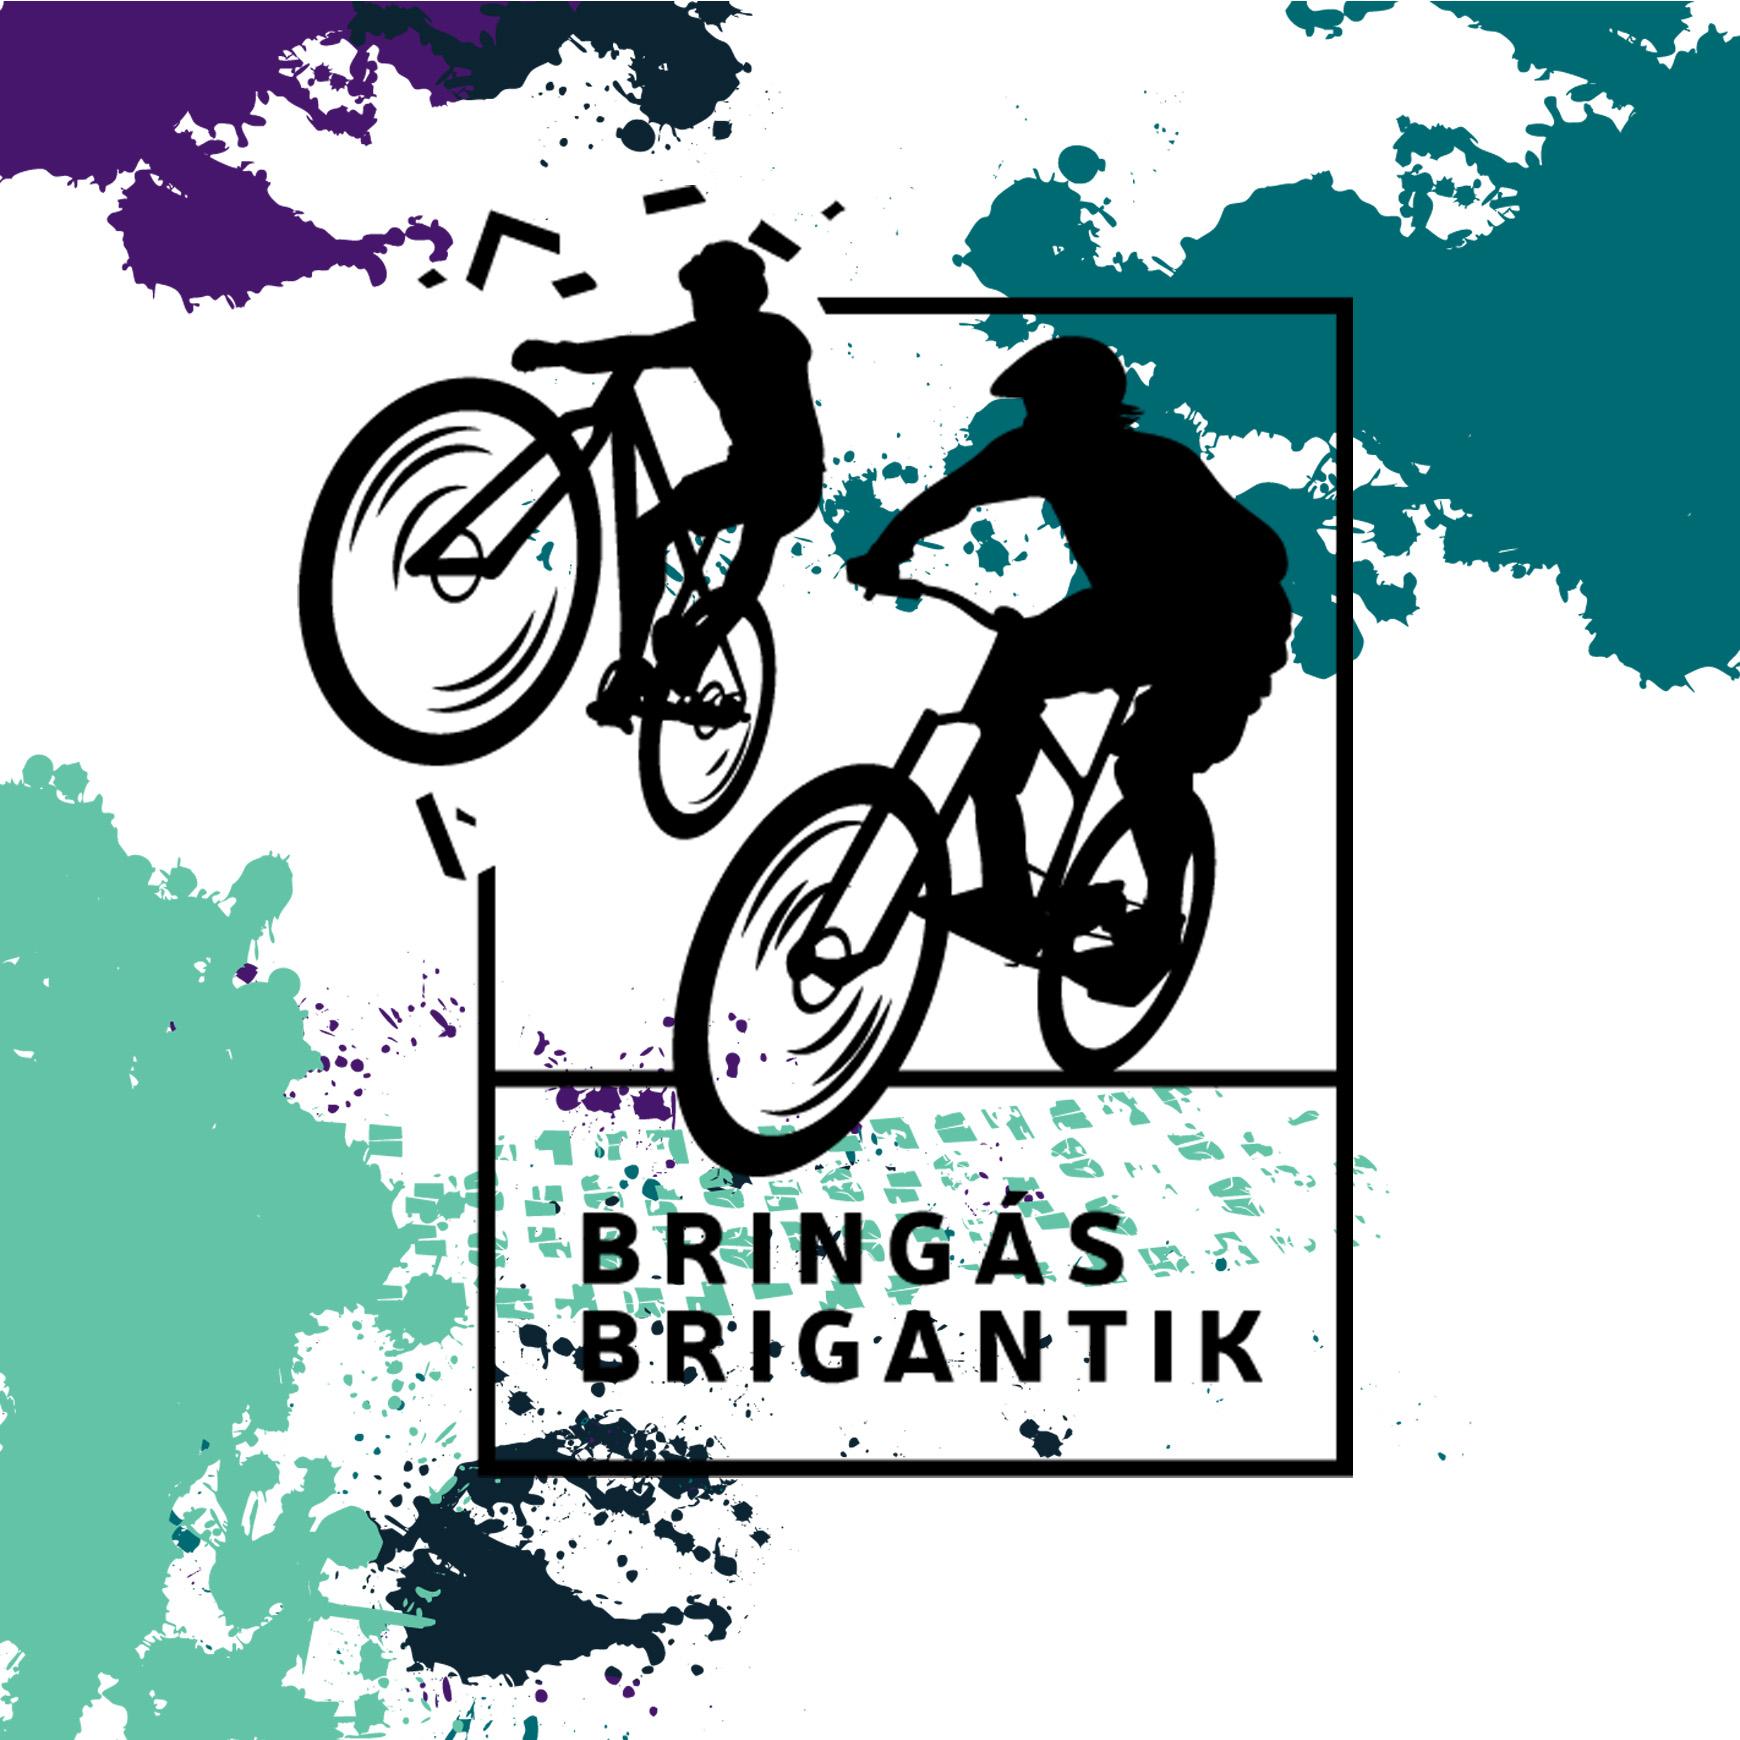 Bringás Brigantik